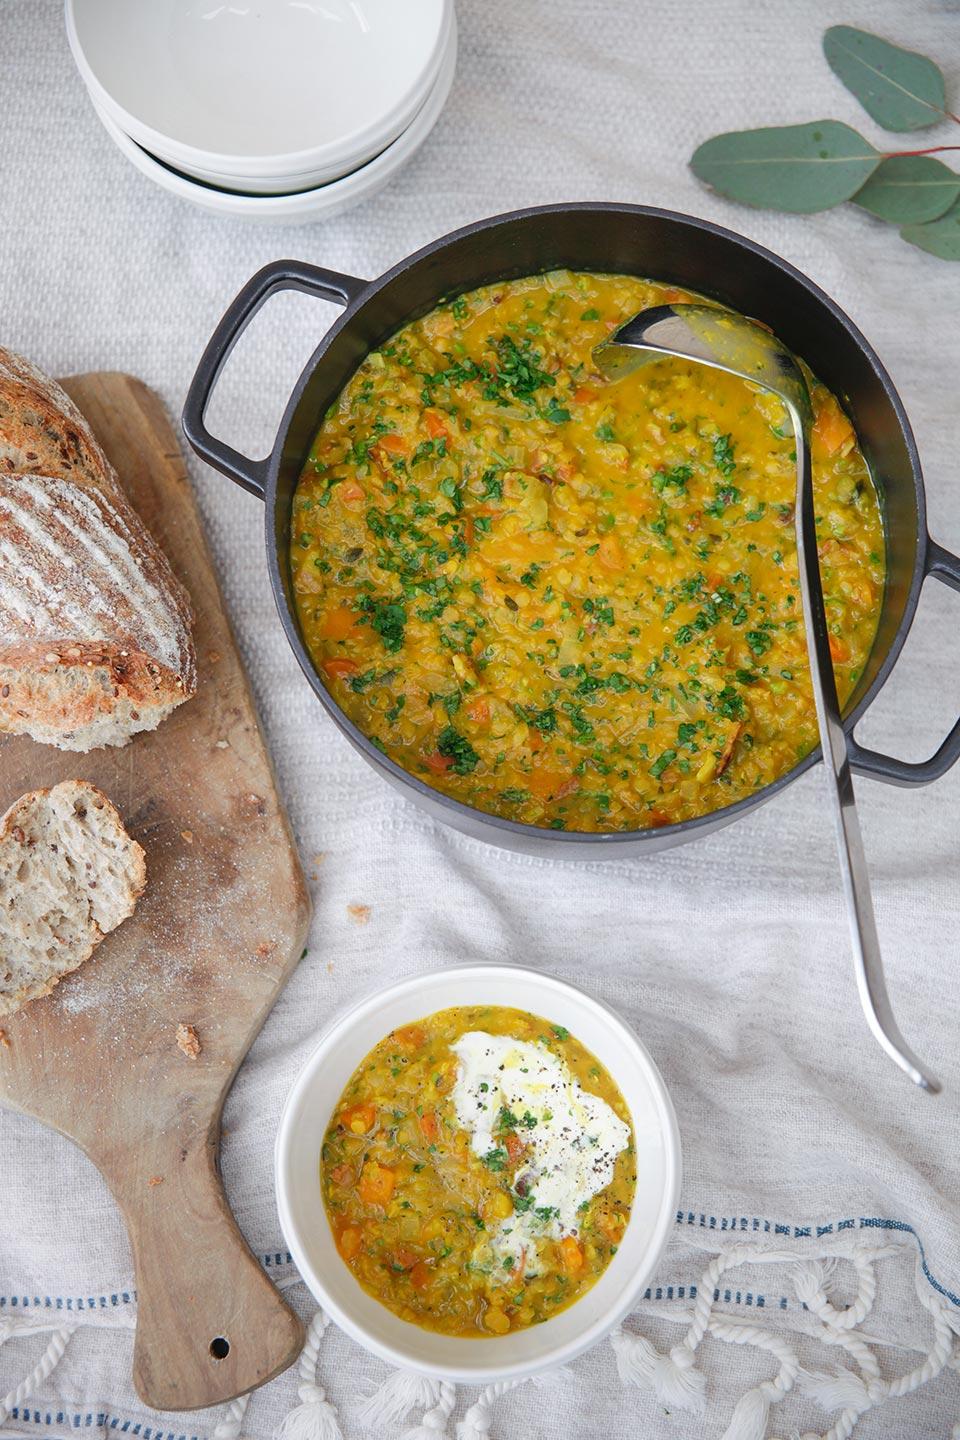 Spiced Pumpkin Red Split Lentil & Turmeric Soup